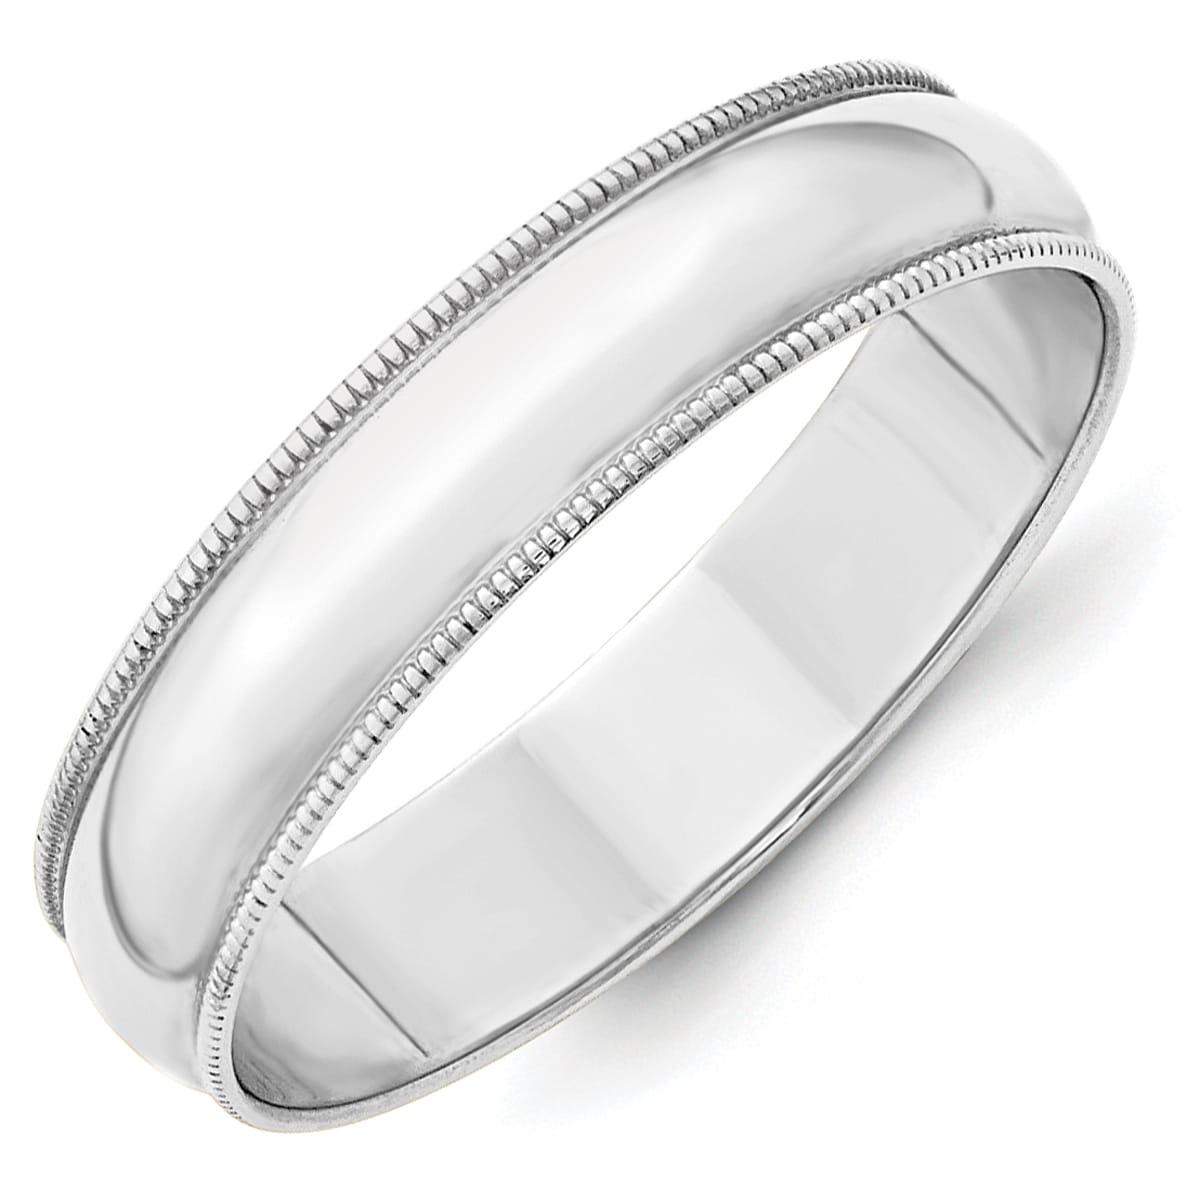 14K White Gold 3mm Light Weight Milgrain Half Round Band Size 4 to 14